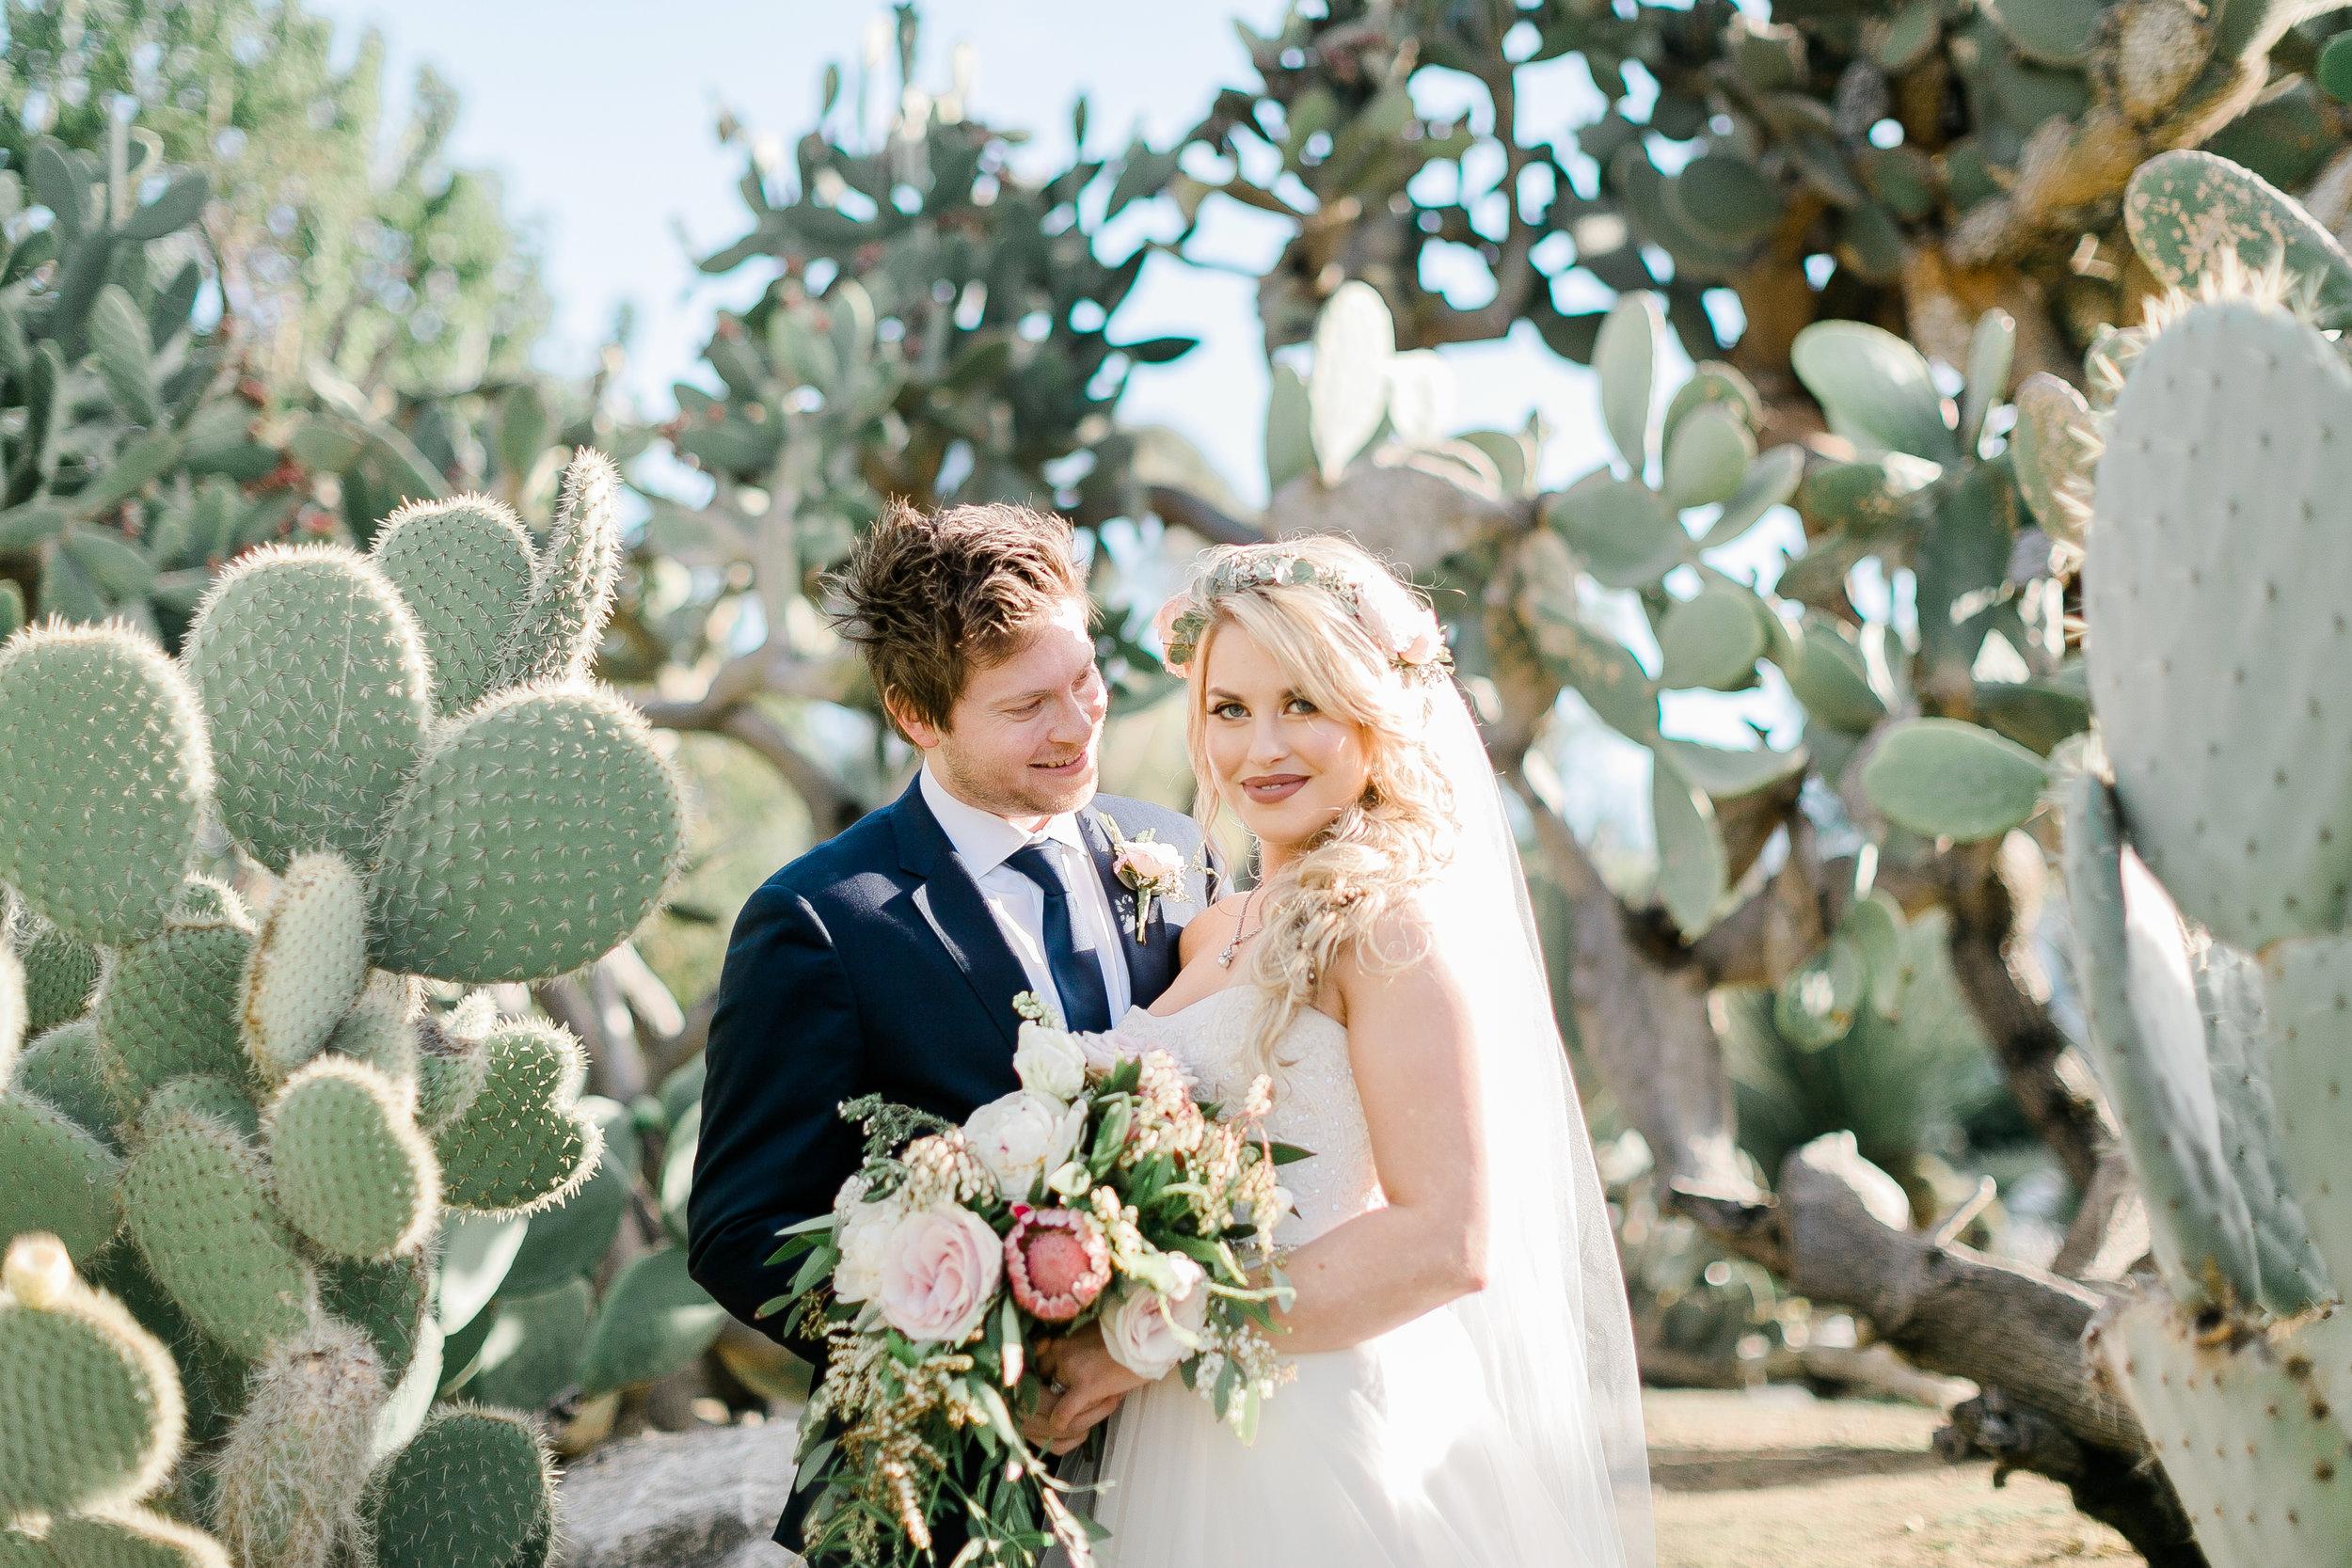 South-Coast-Botanic-Garden-Wedding-Planner52.jpg